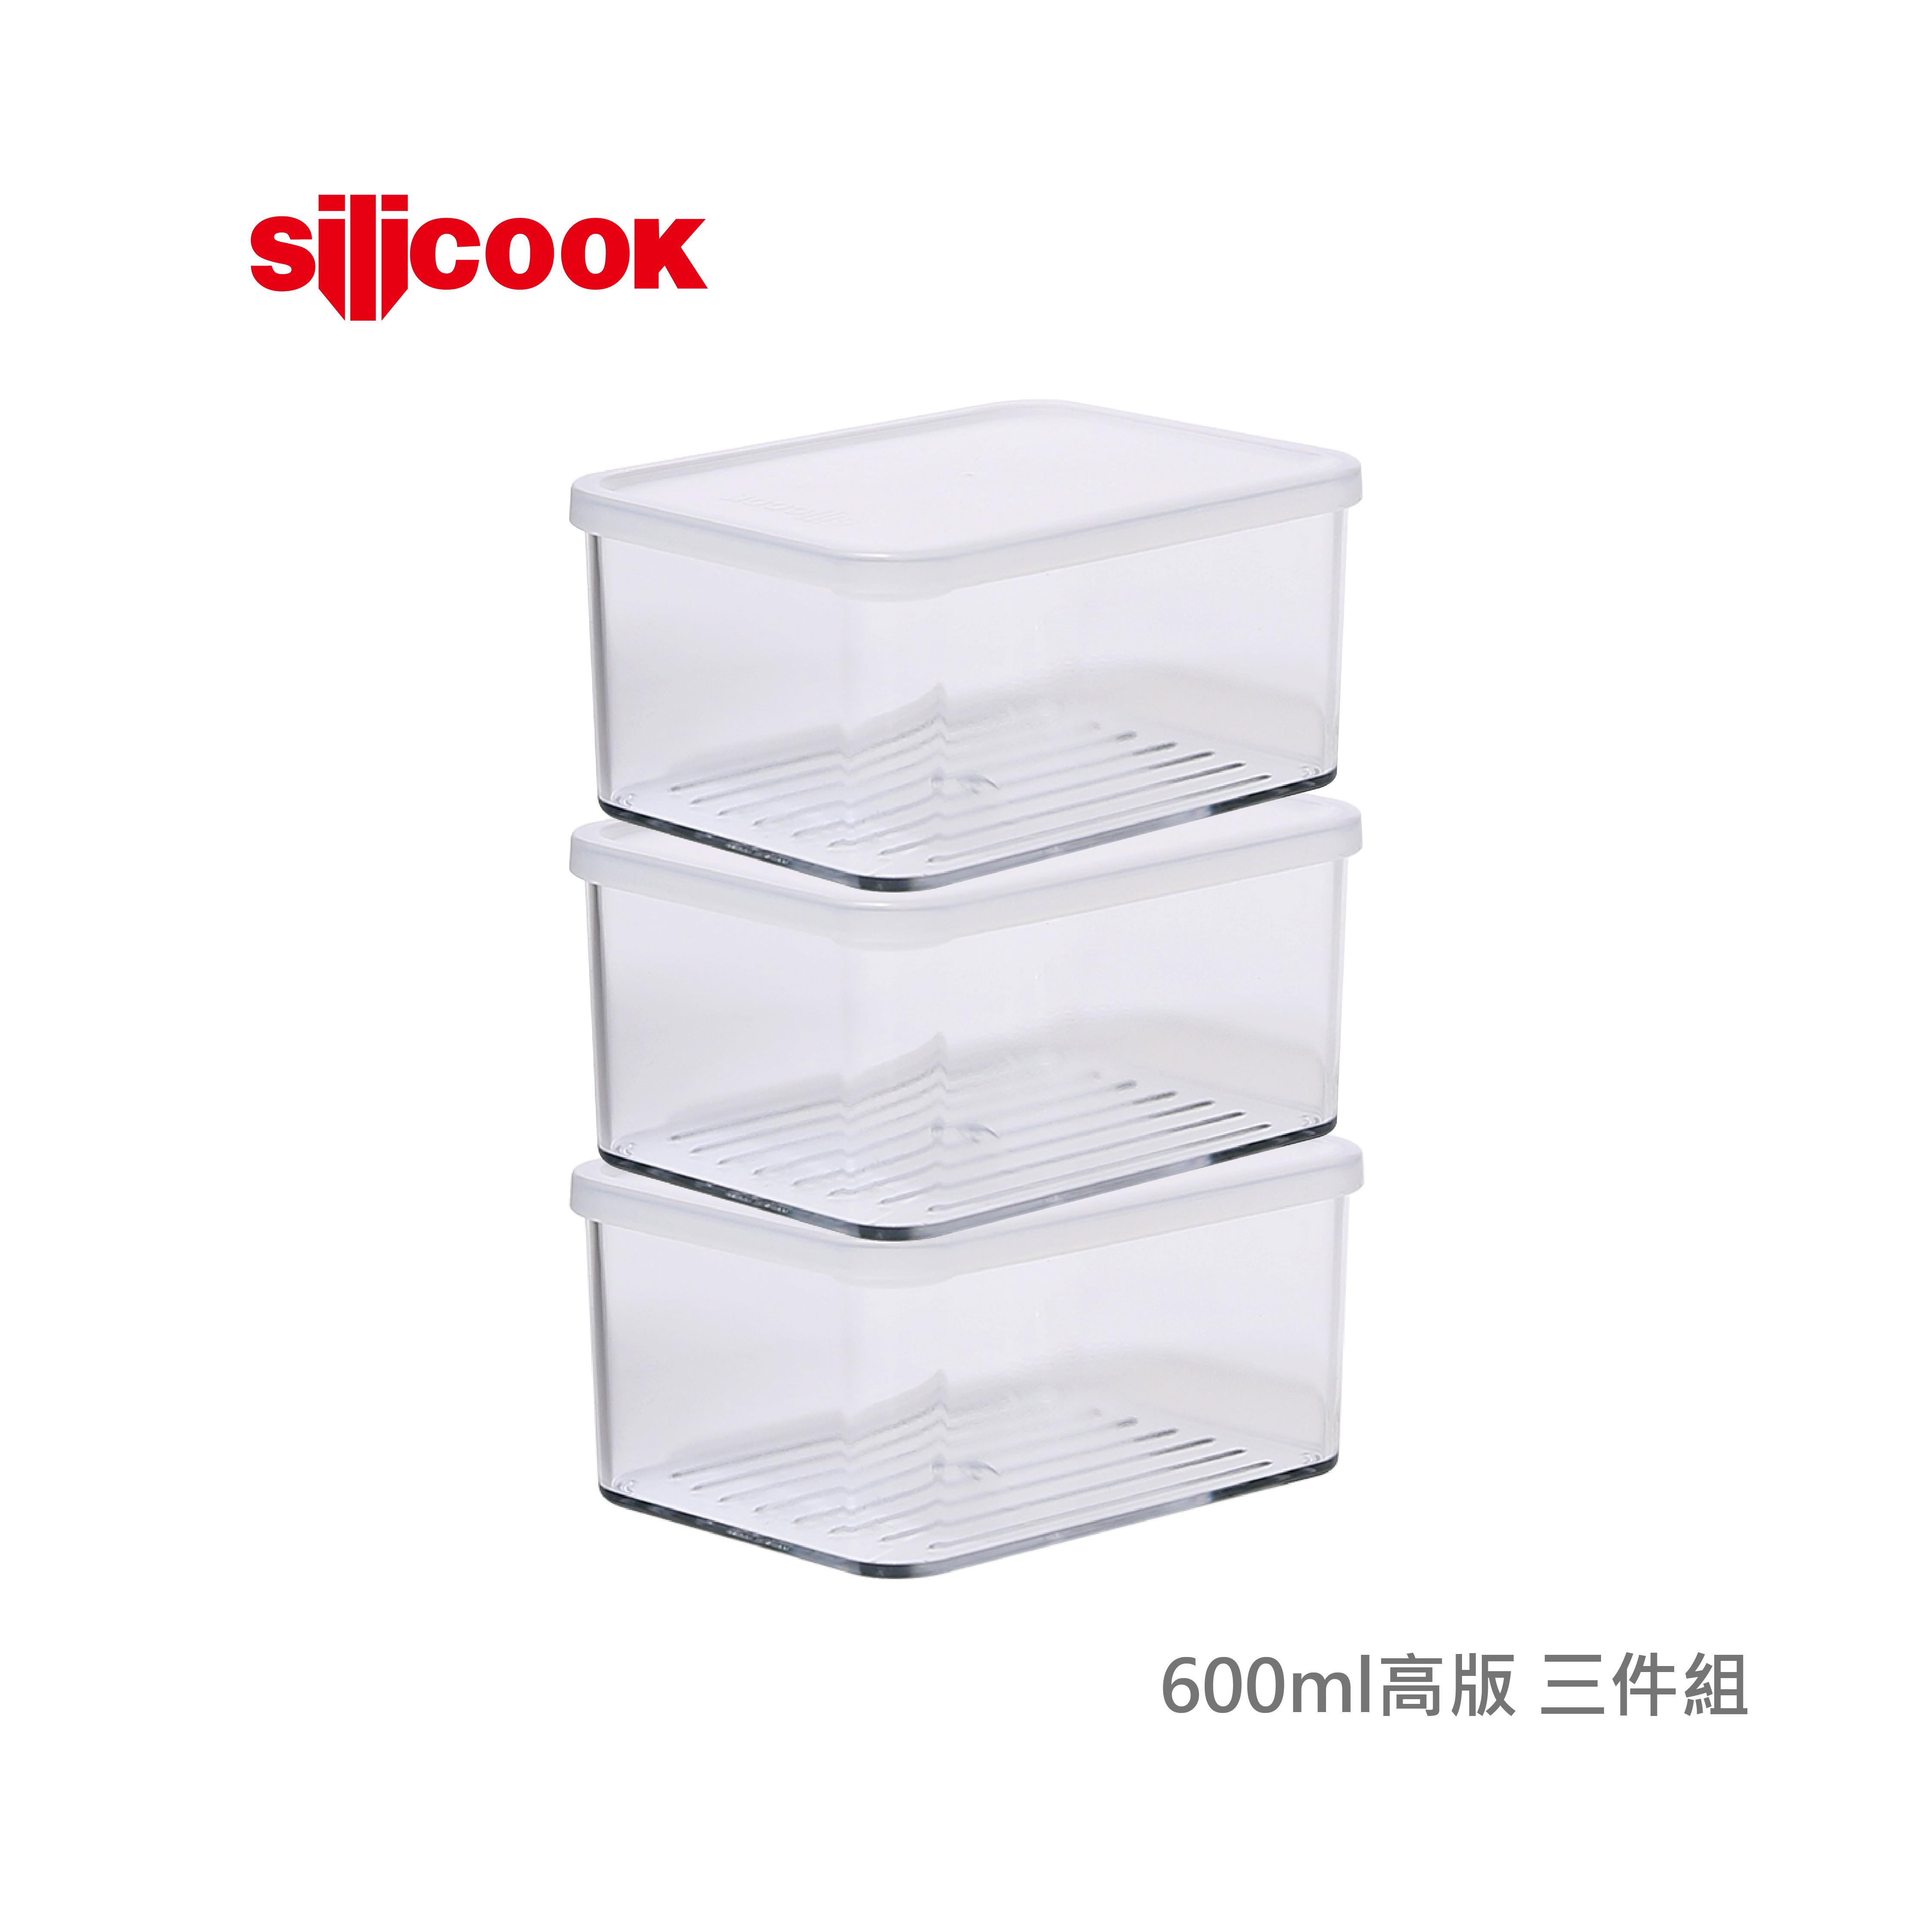 Silicook 冰箱收納盒600ml(高版) 三件組